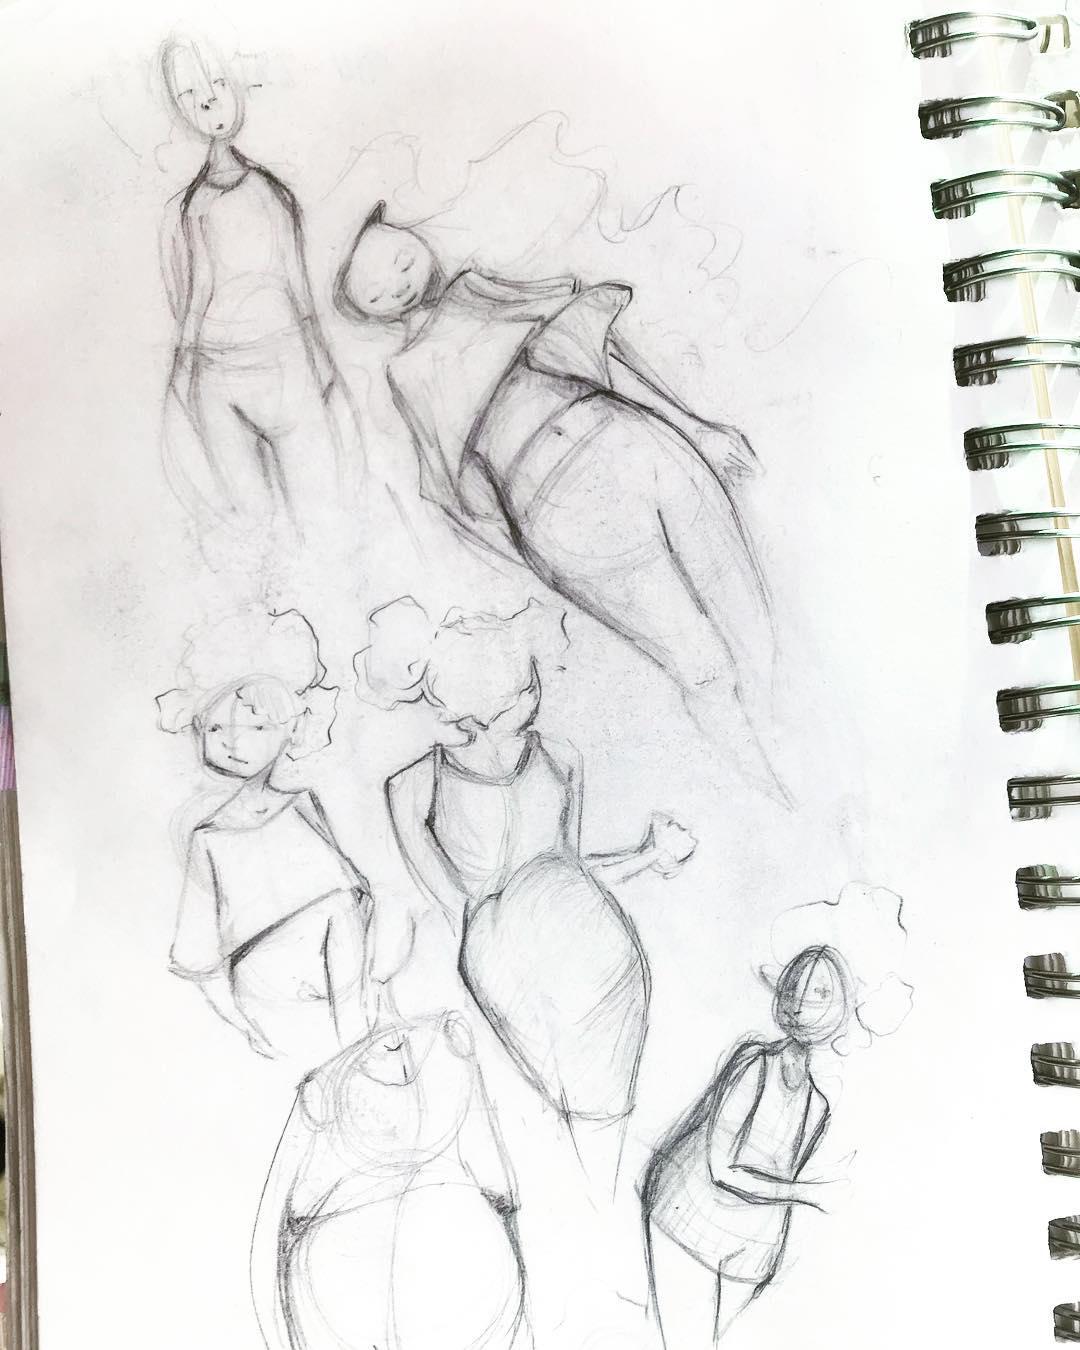 [ Inside the Sketchbook 2 // 2018 // Penicl ]Just flipping through pages ⭐️ #karlanoelart #insidethesketchbook .